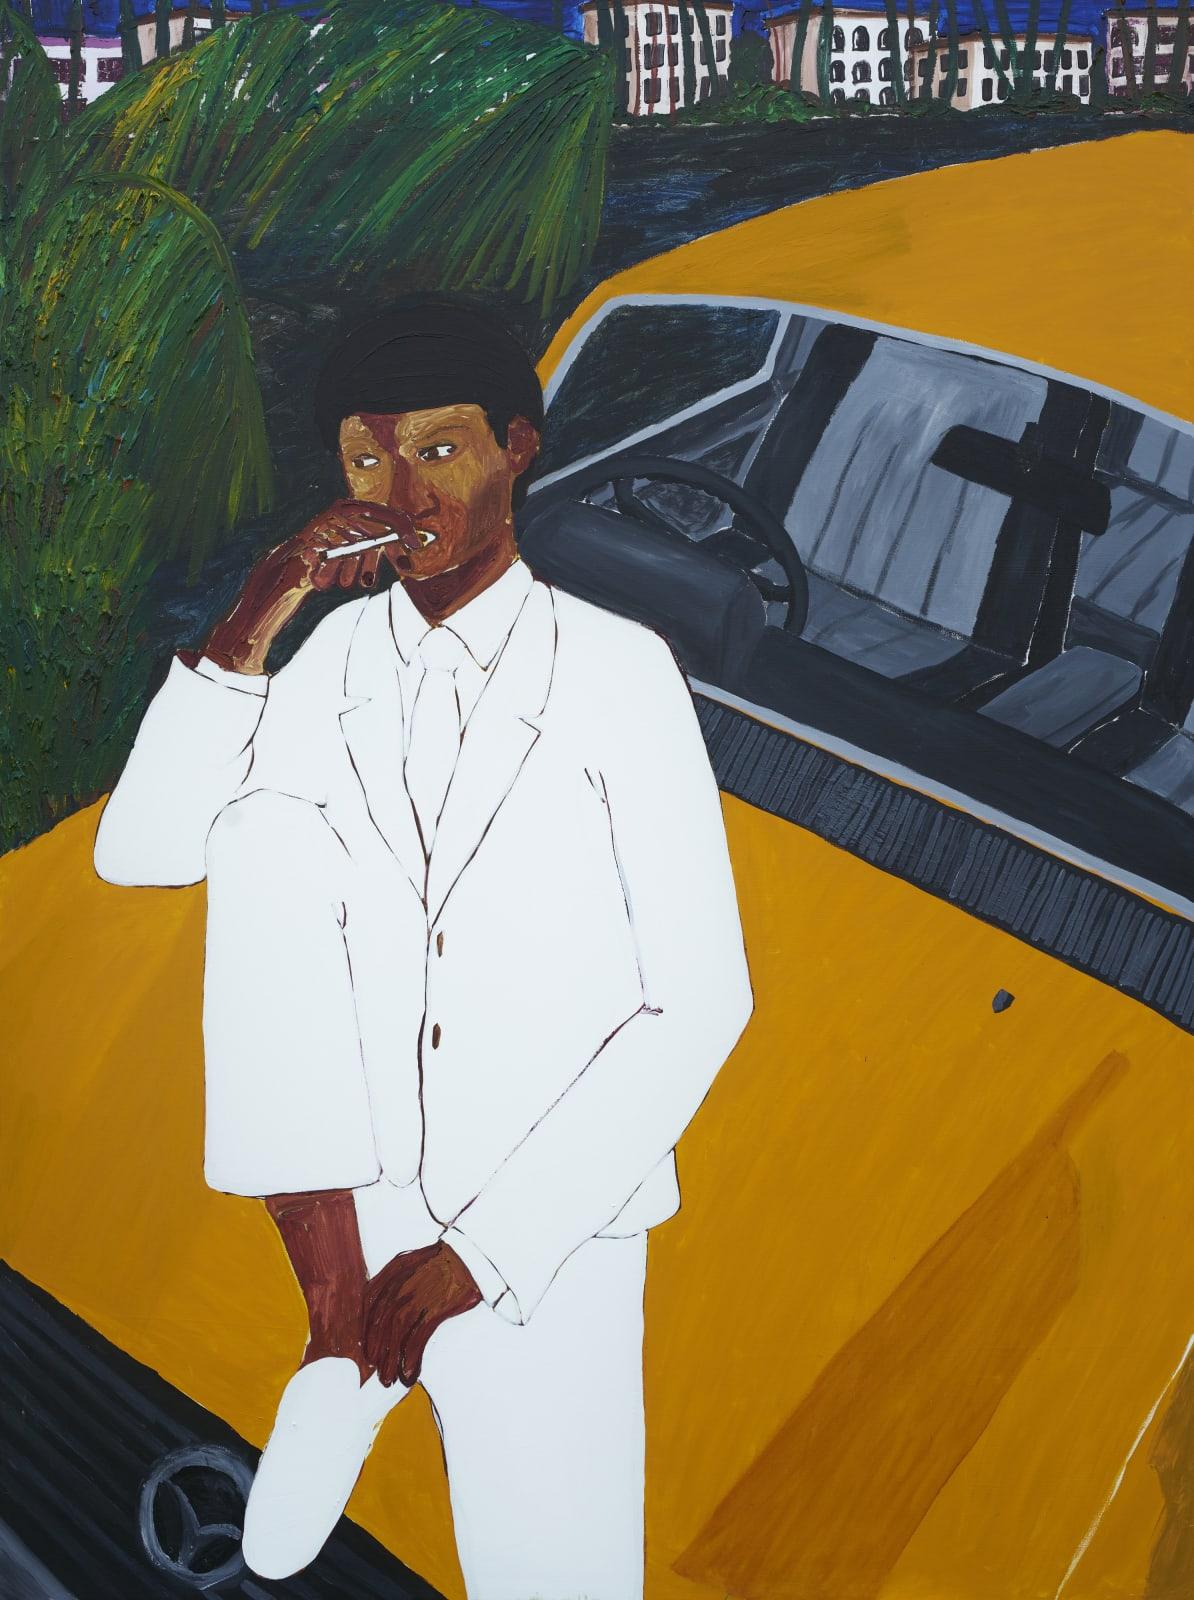 Gideon Appah, Nonchalance, 2020